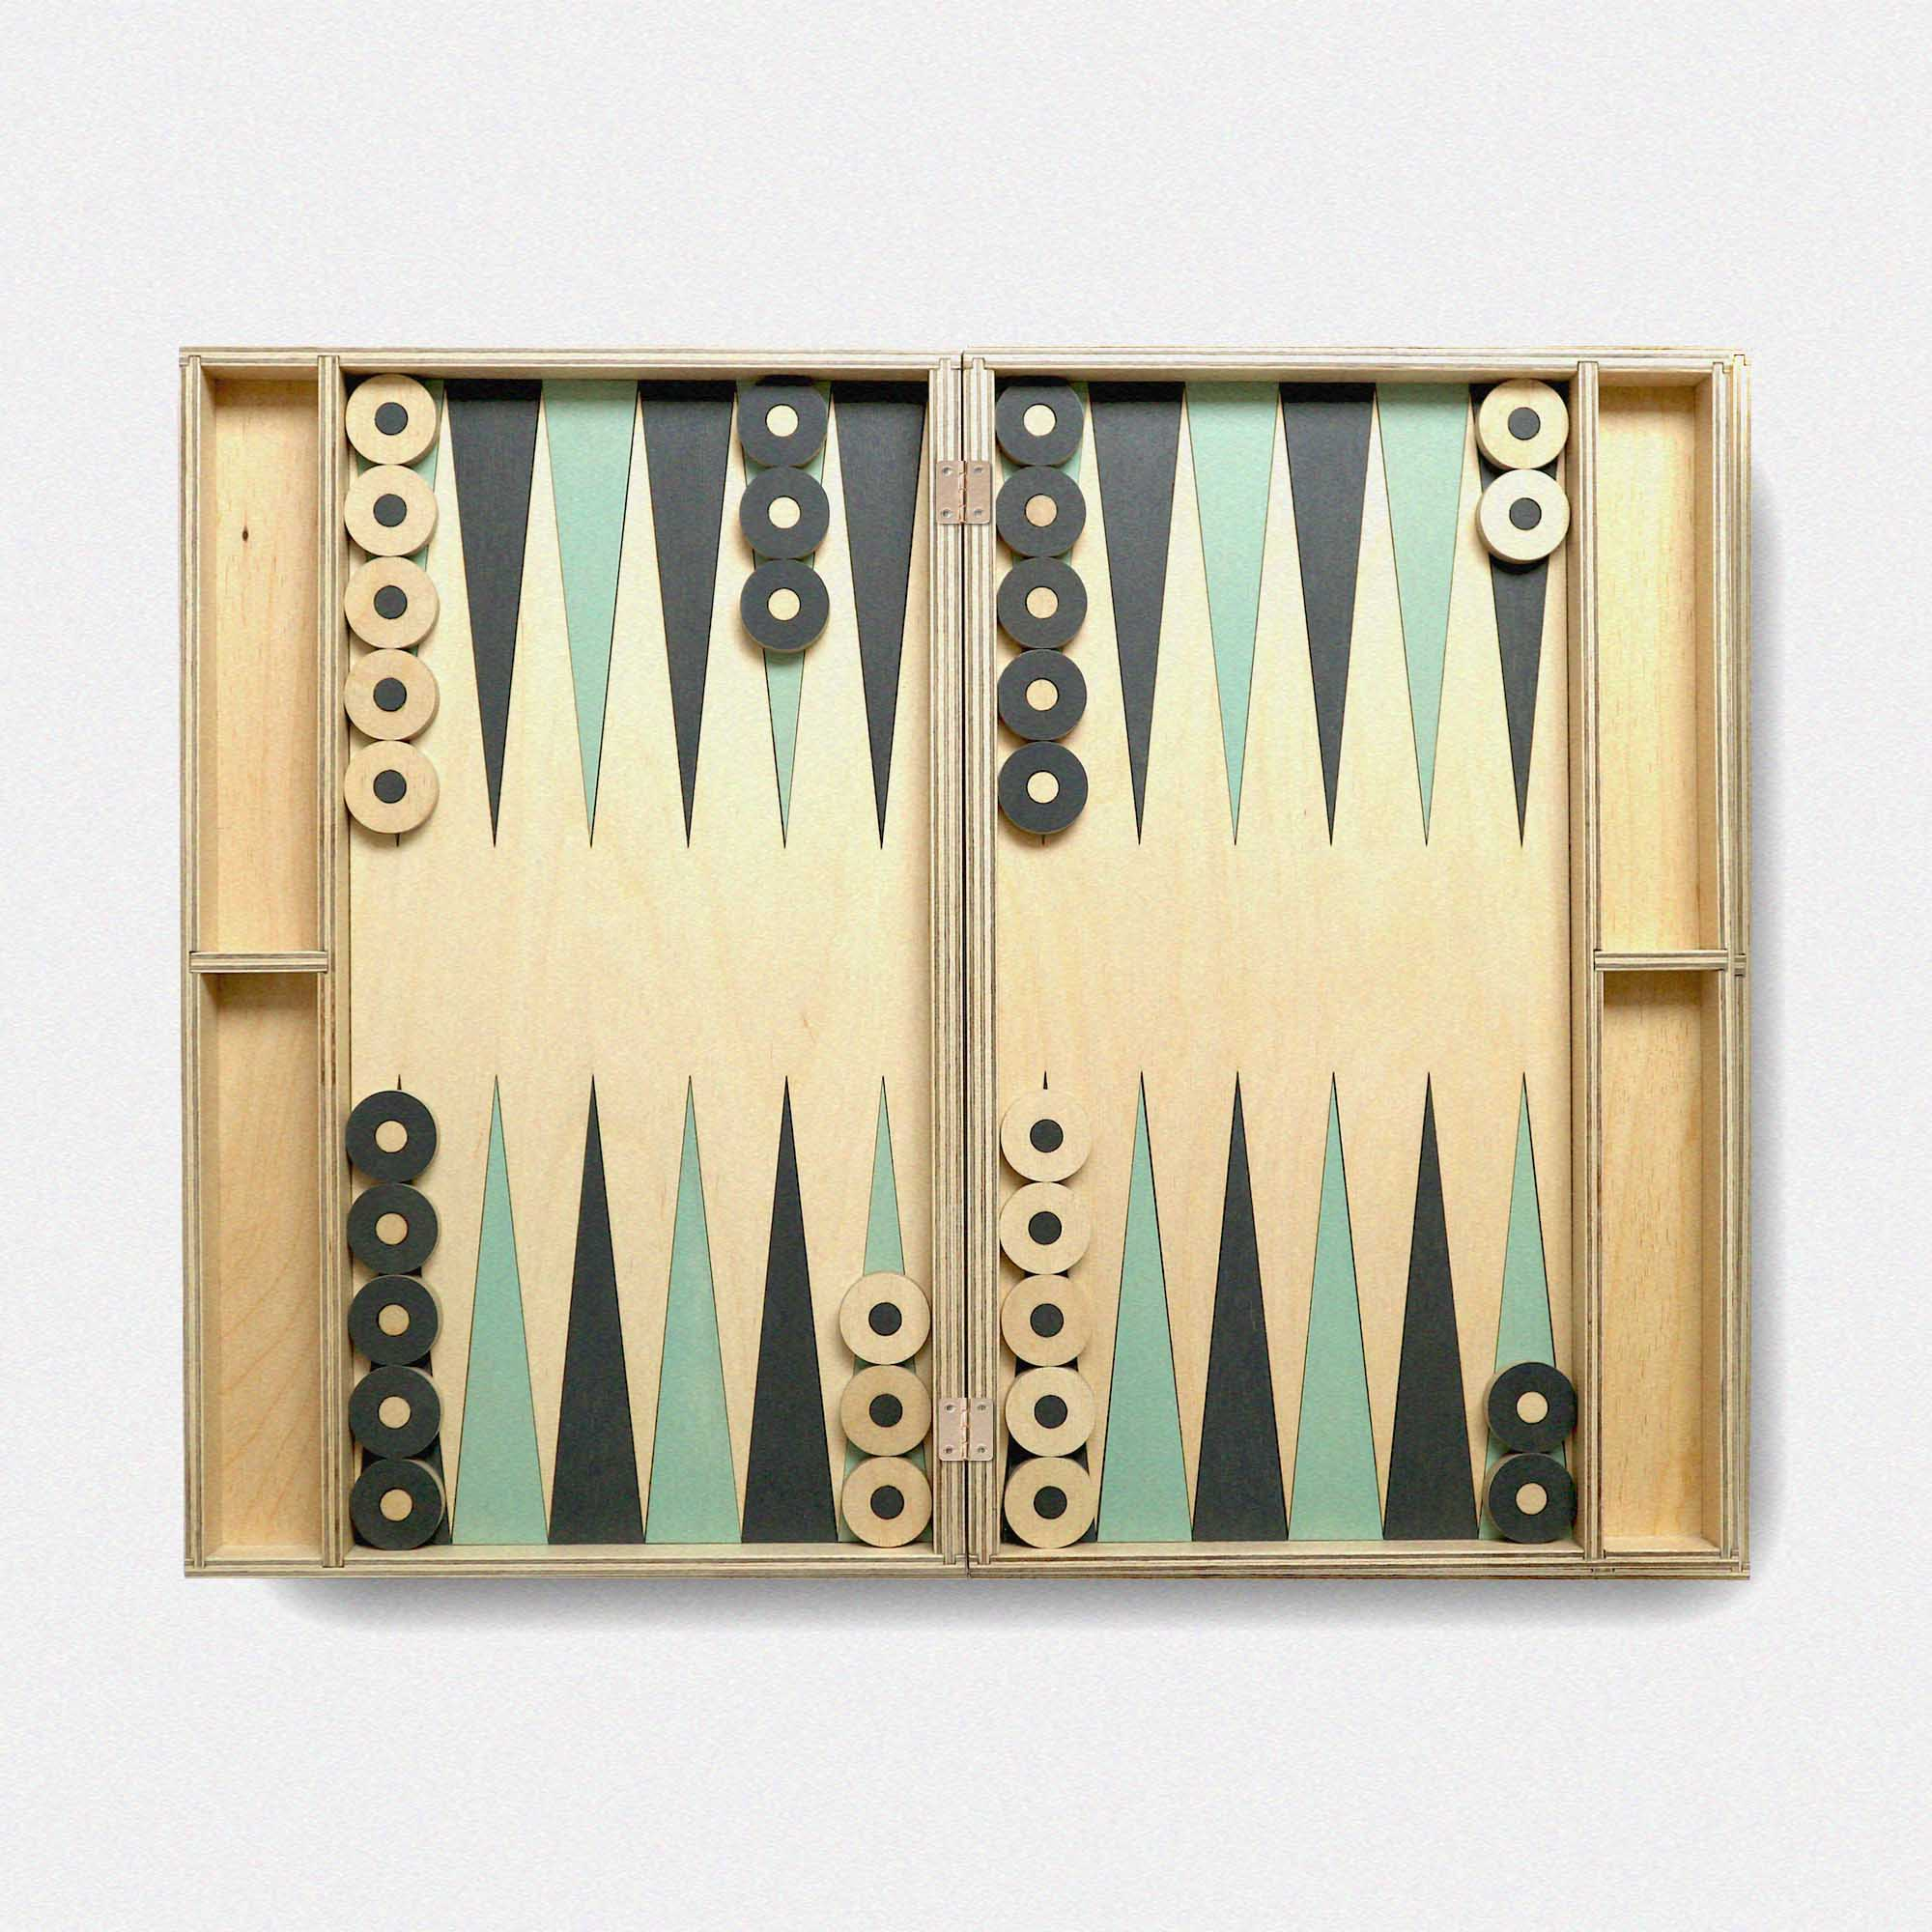 Bespoke Backgammon Game